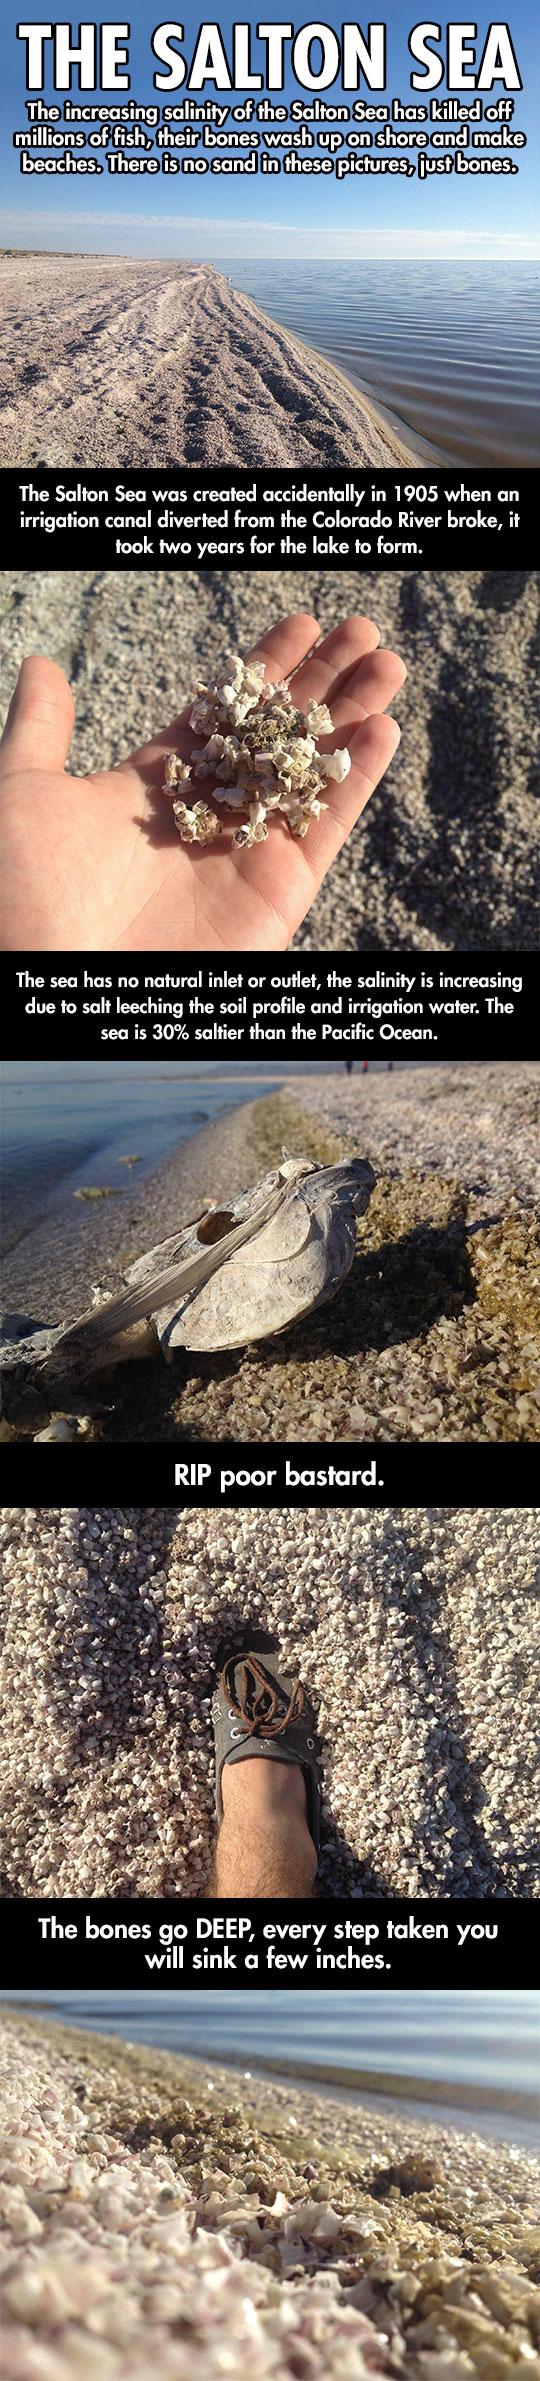 The creepy story of the Salton Sea…